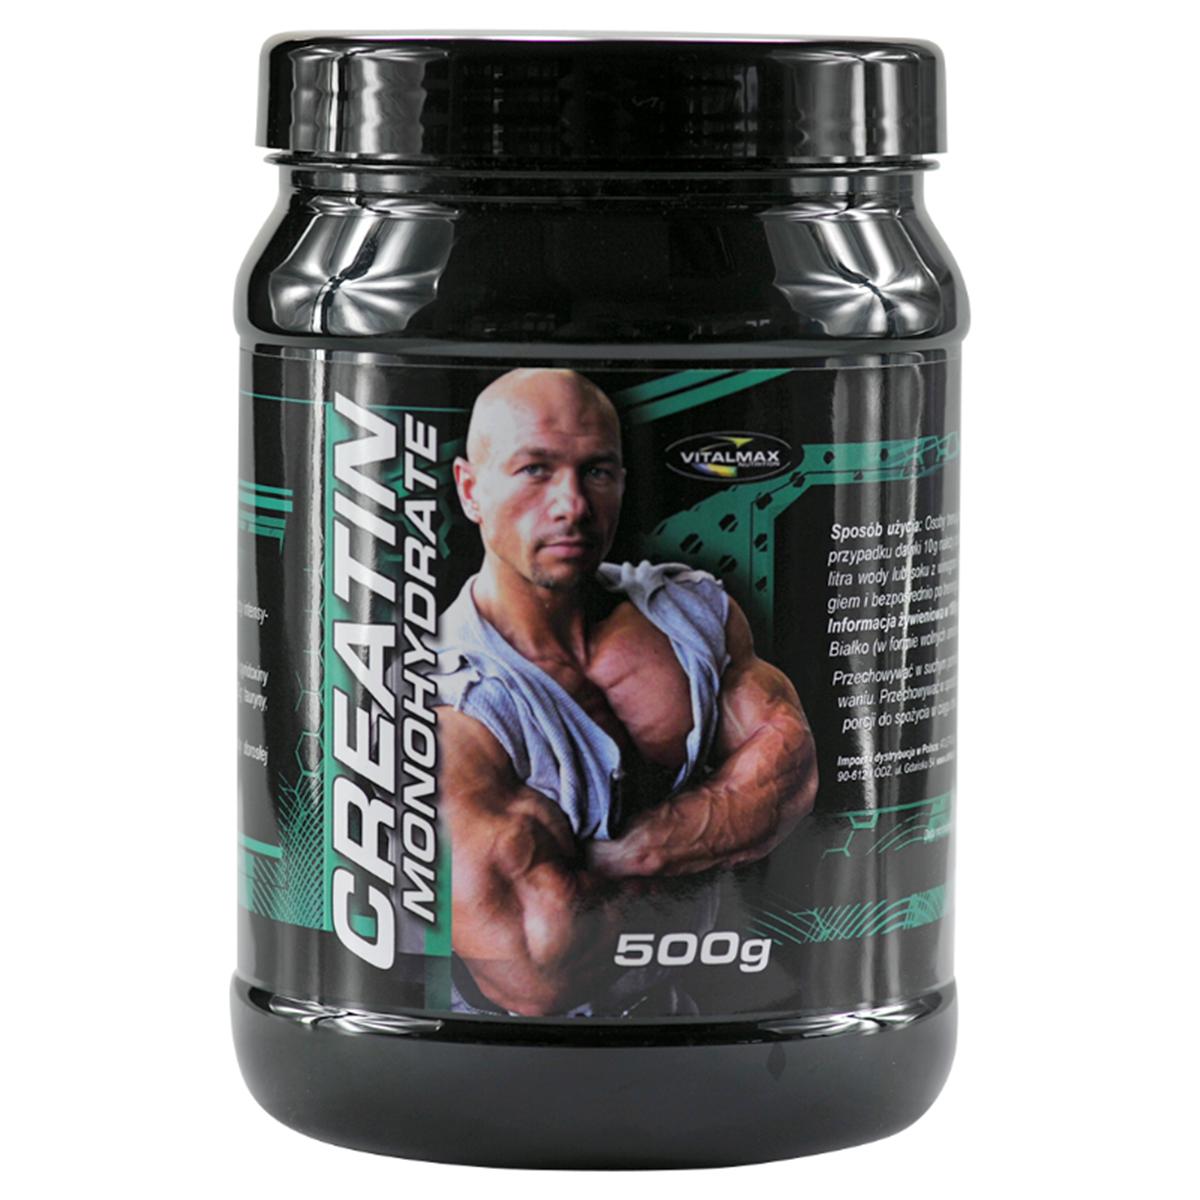 63f6c32c4c57 30 PLN • Creatin Monohydrate 500g - Vitalmax • NAJTANIEJ • Sklep SFD